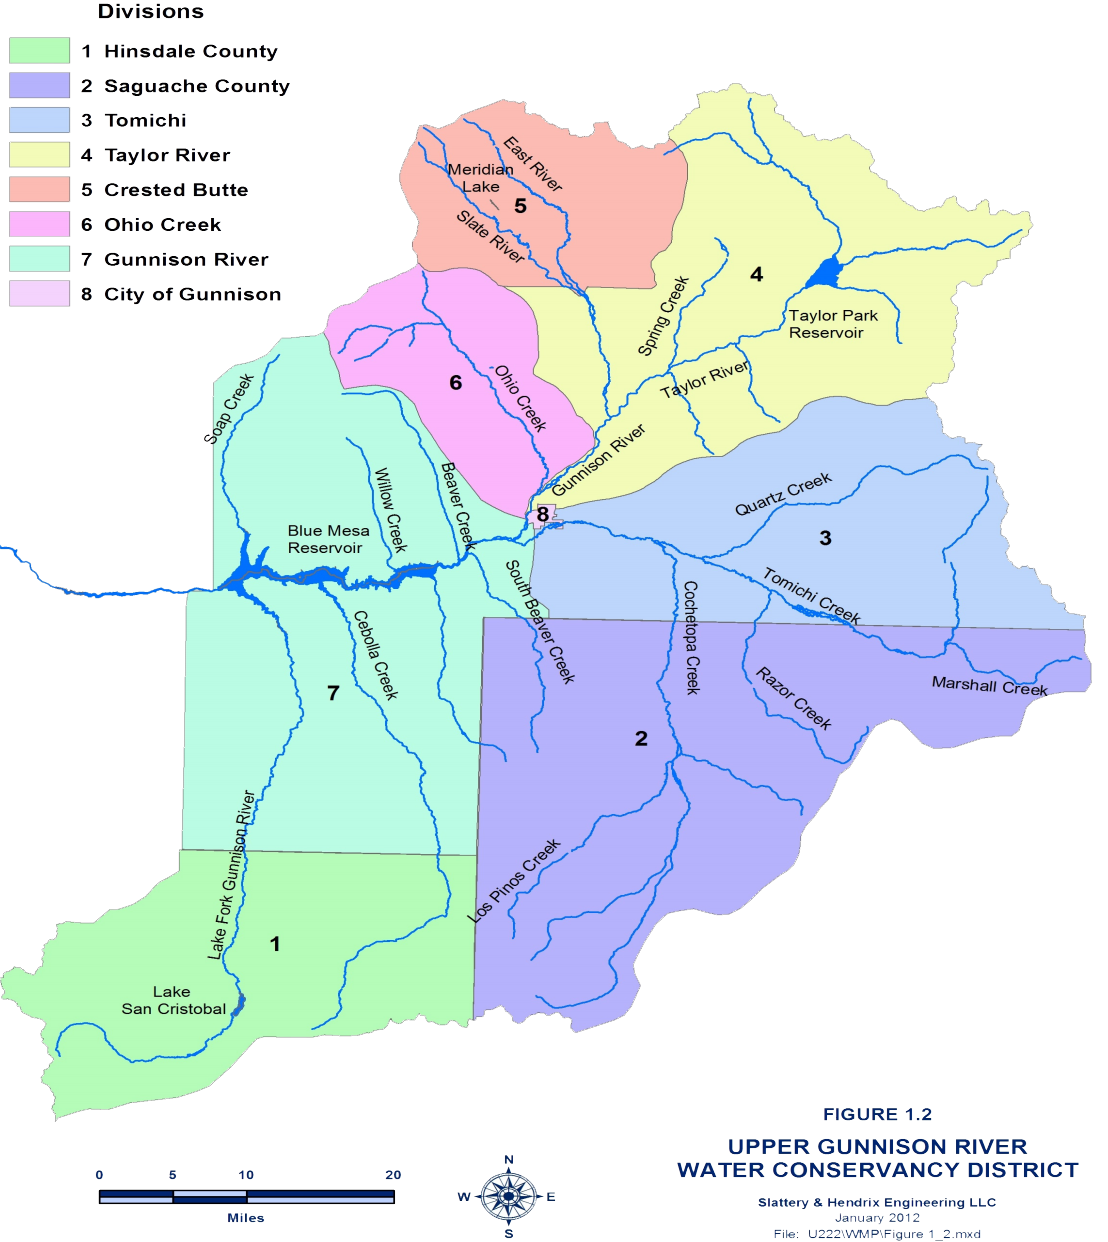 UGRWCD Divisions